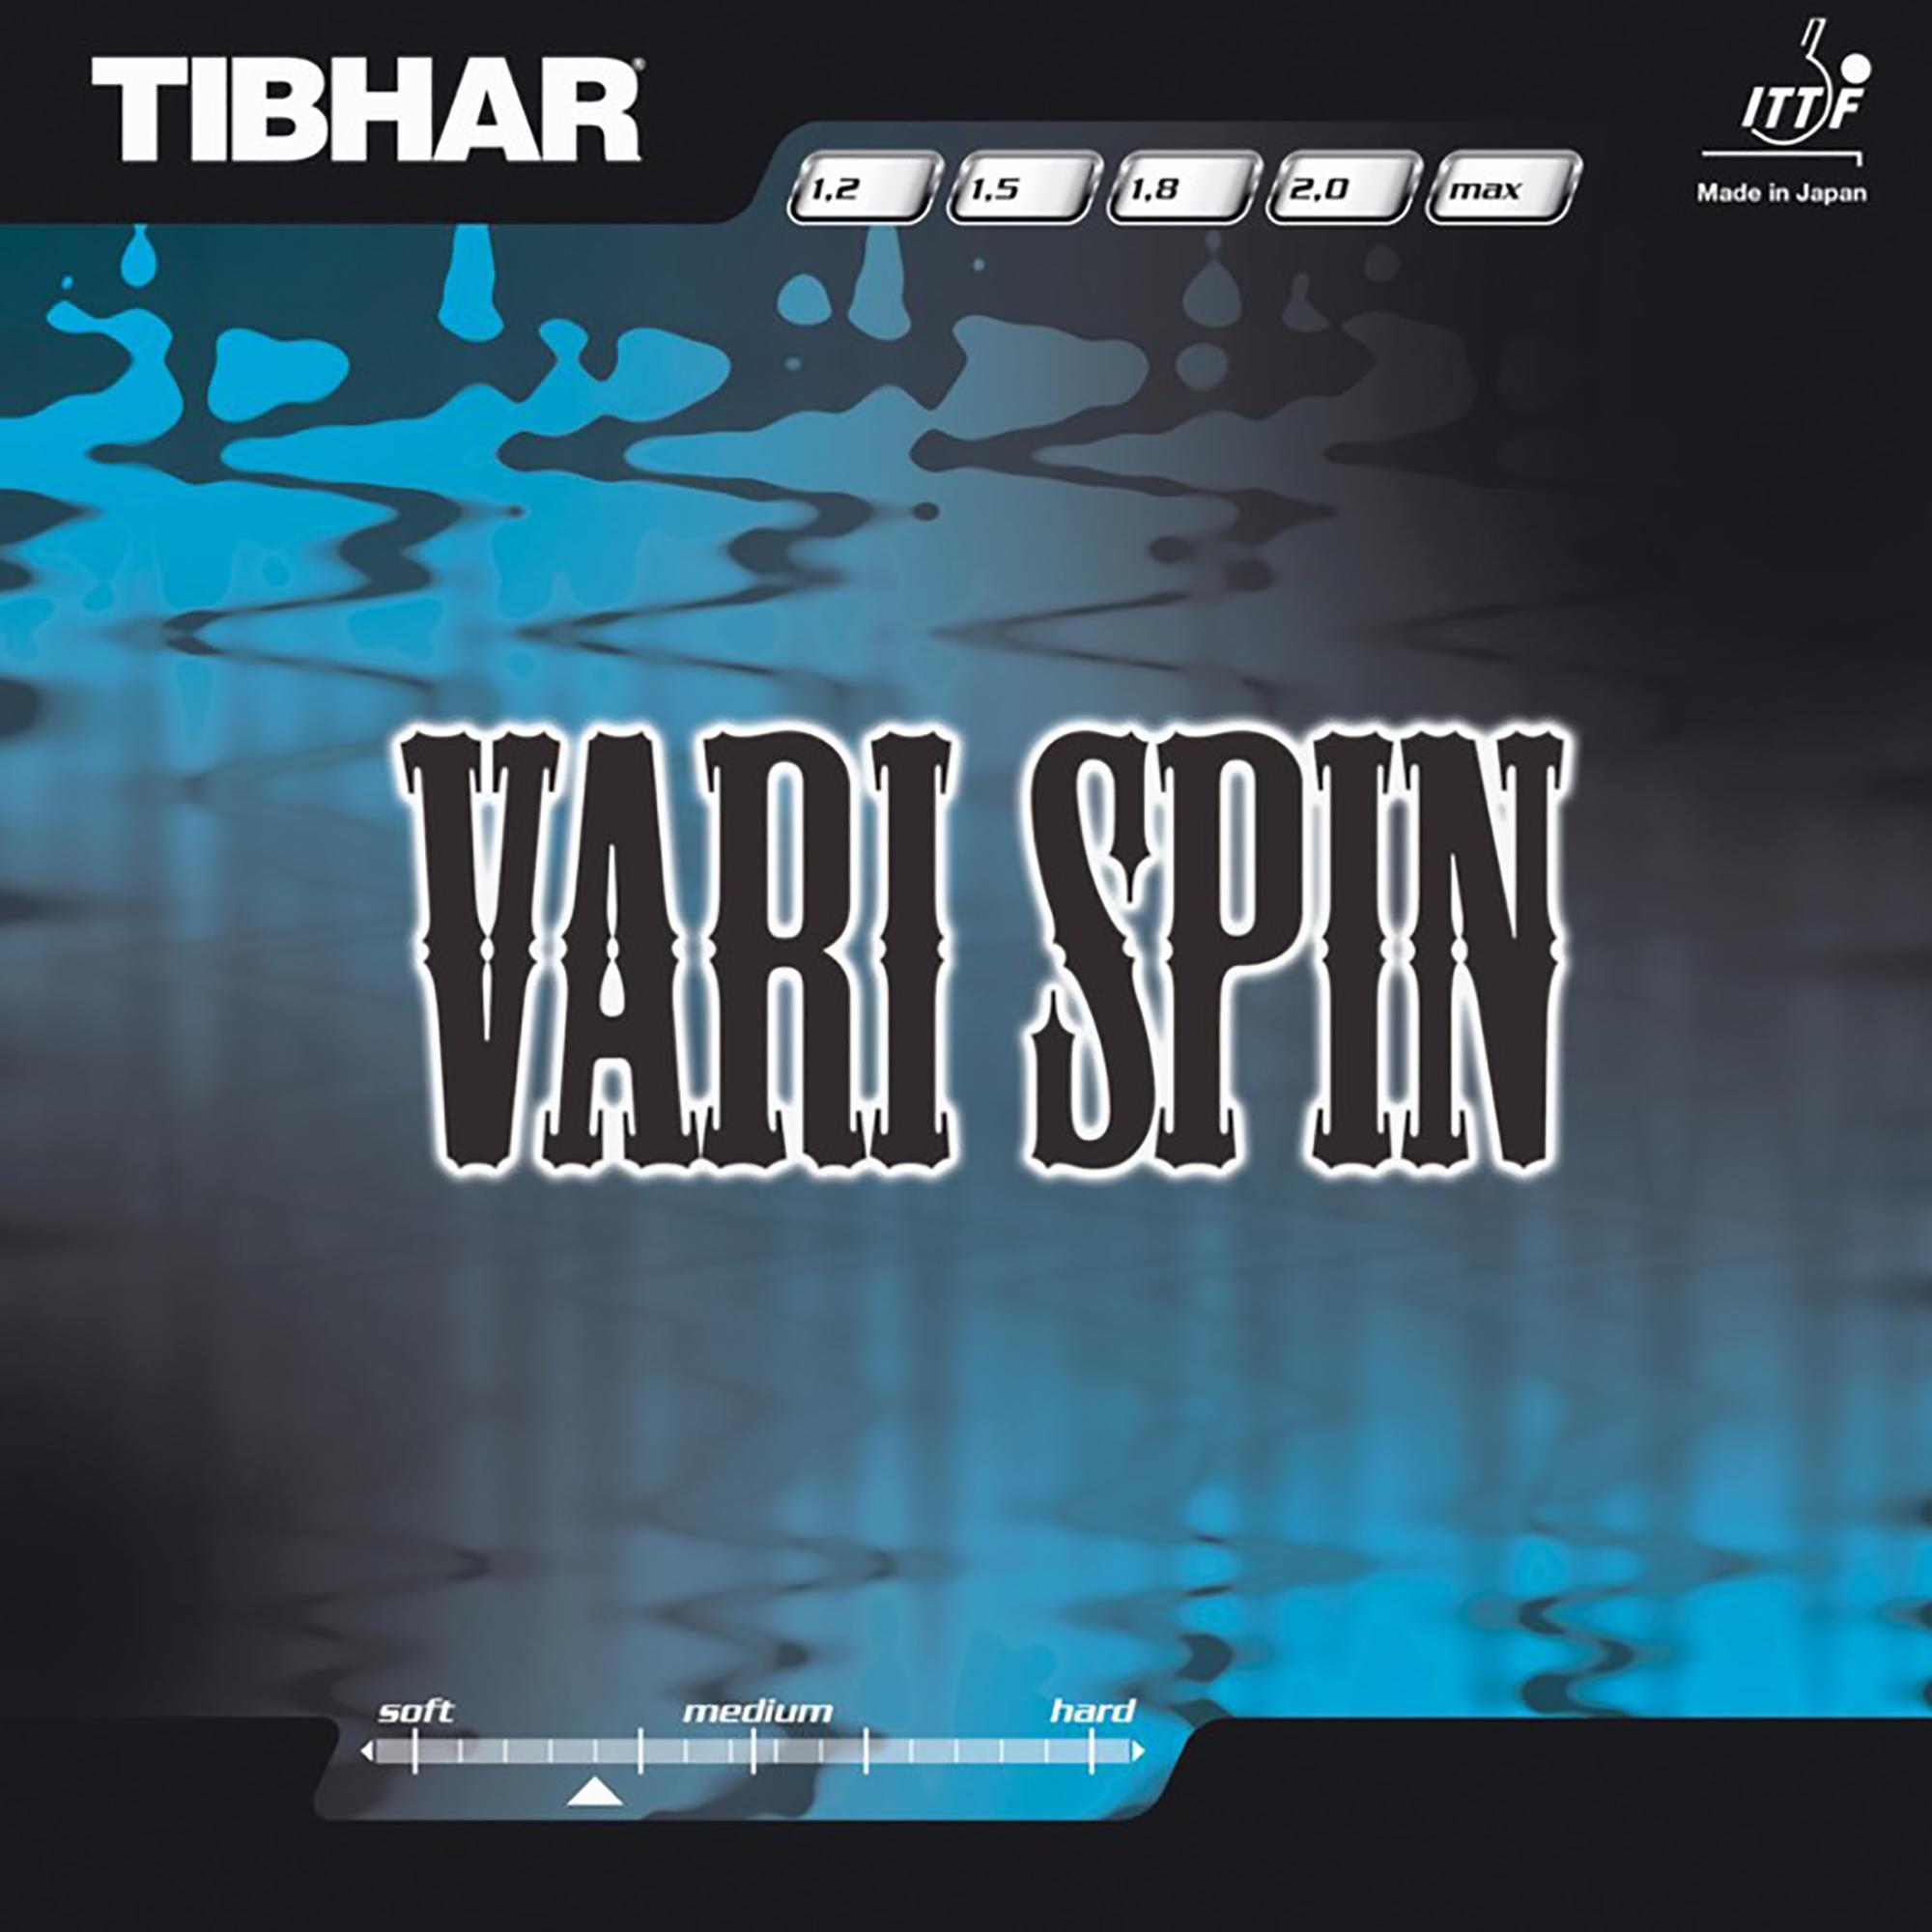 Tibhar Rubber voor tafeltennisbat Vari Spin